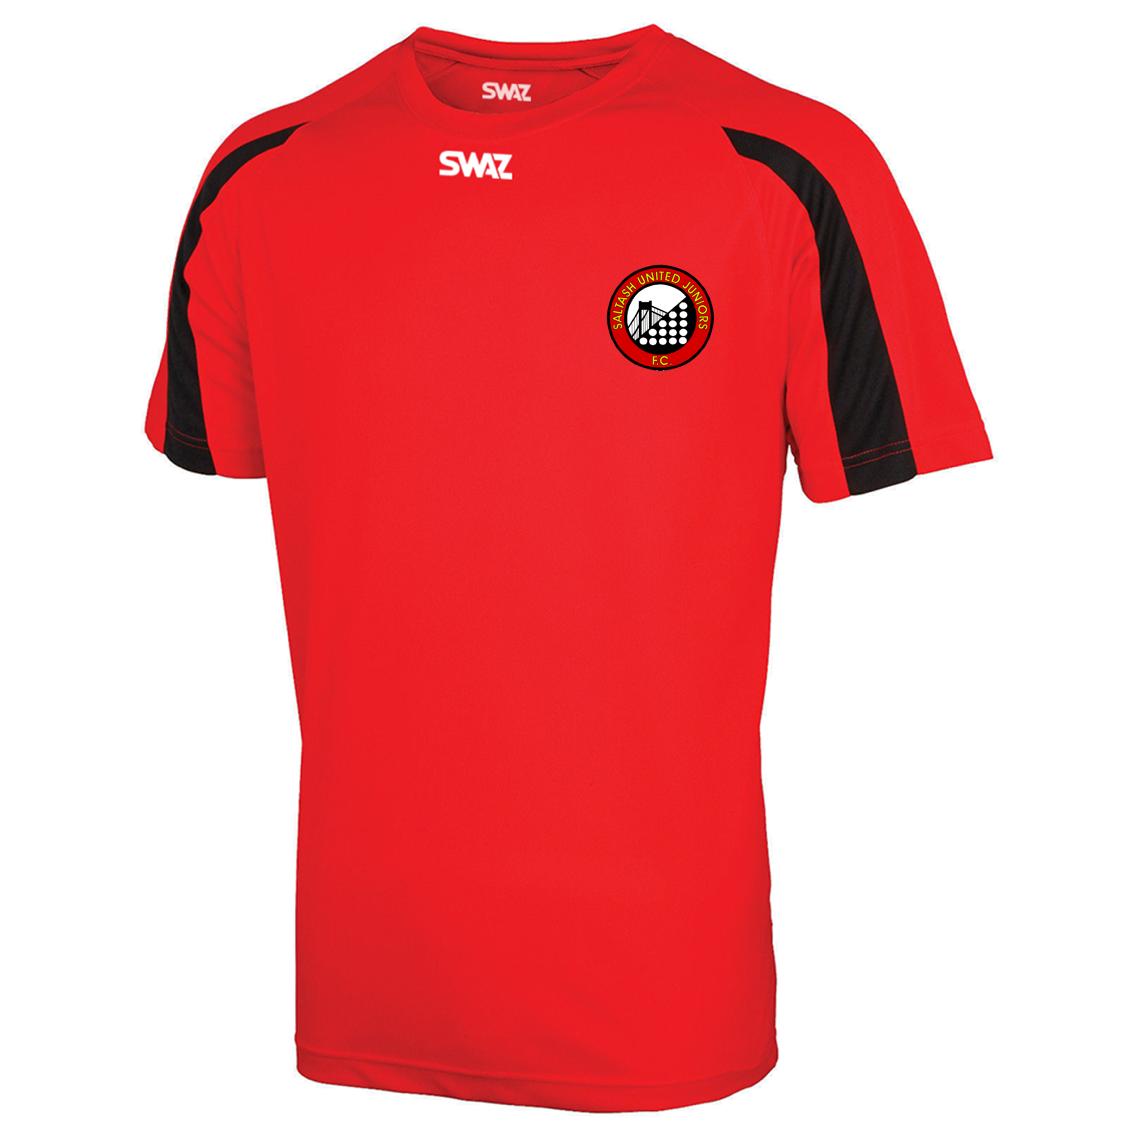 SWAZ Saltash United Juniors Adult Premier Training T-Shirt – Red/Black